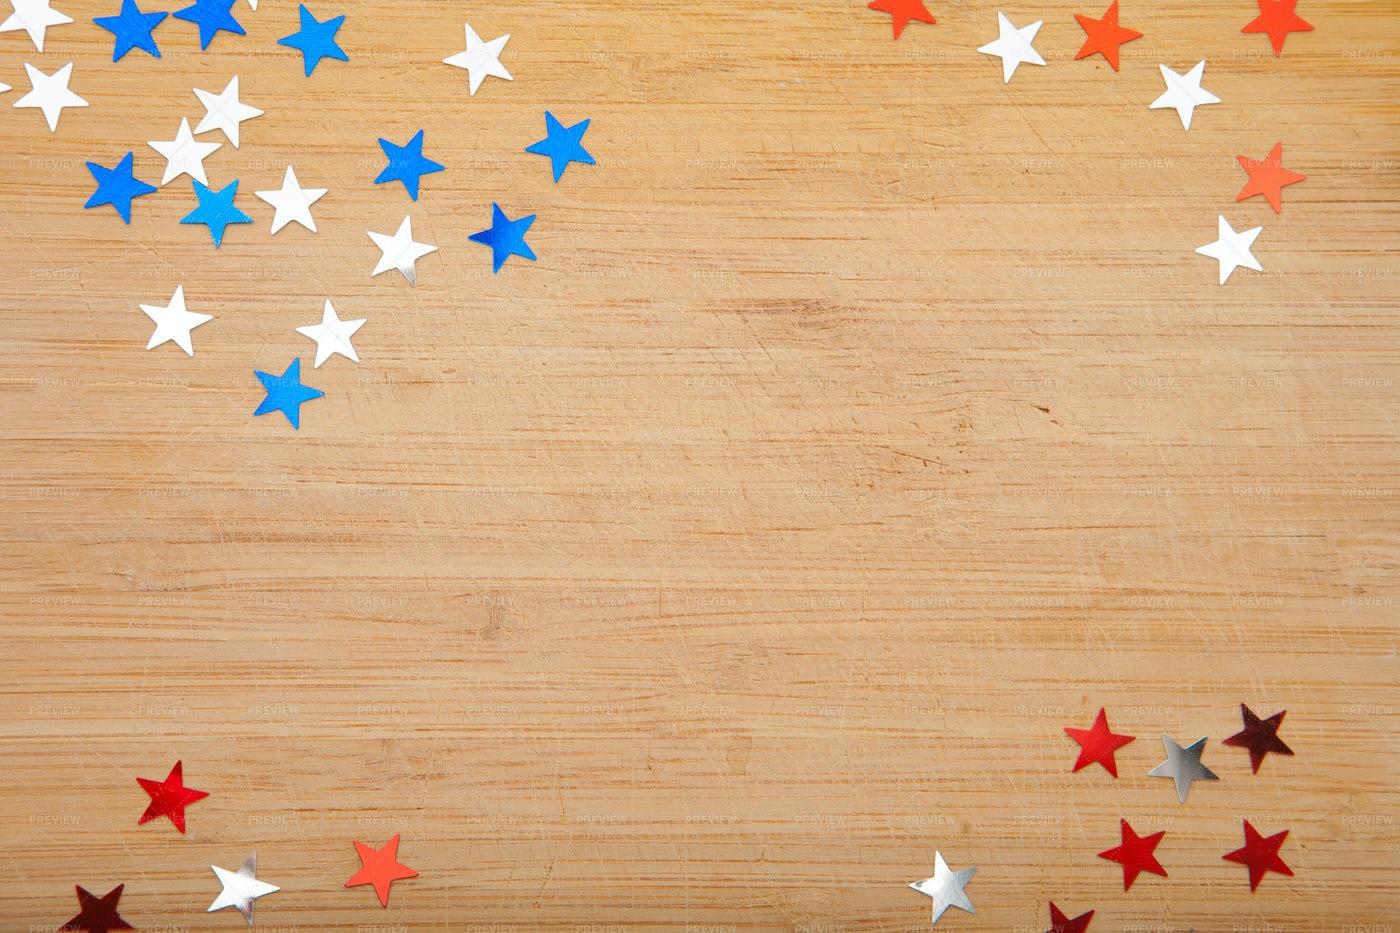 Confetti Stars On Wooden Background: Stock Photos